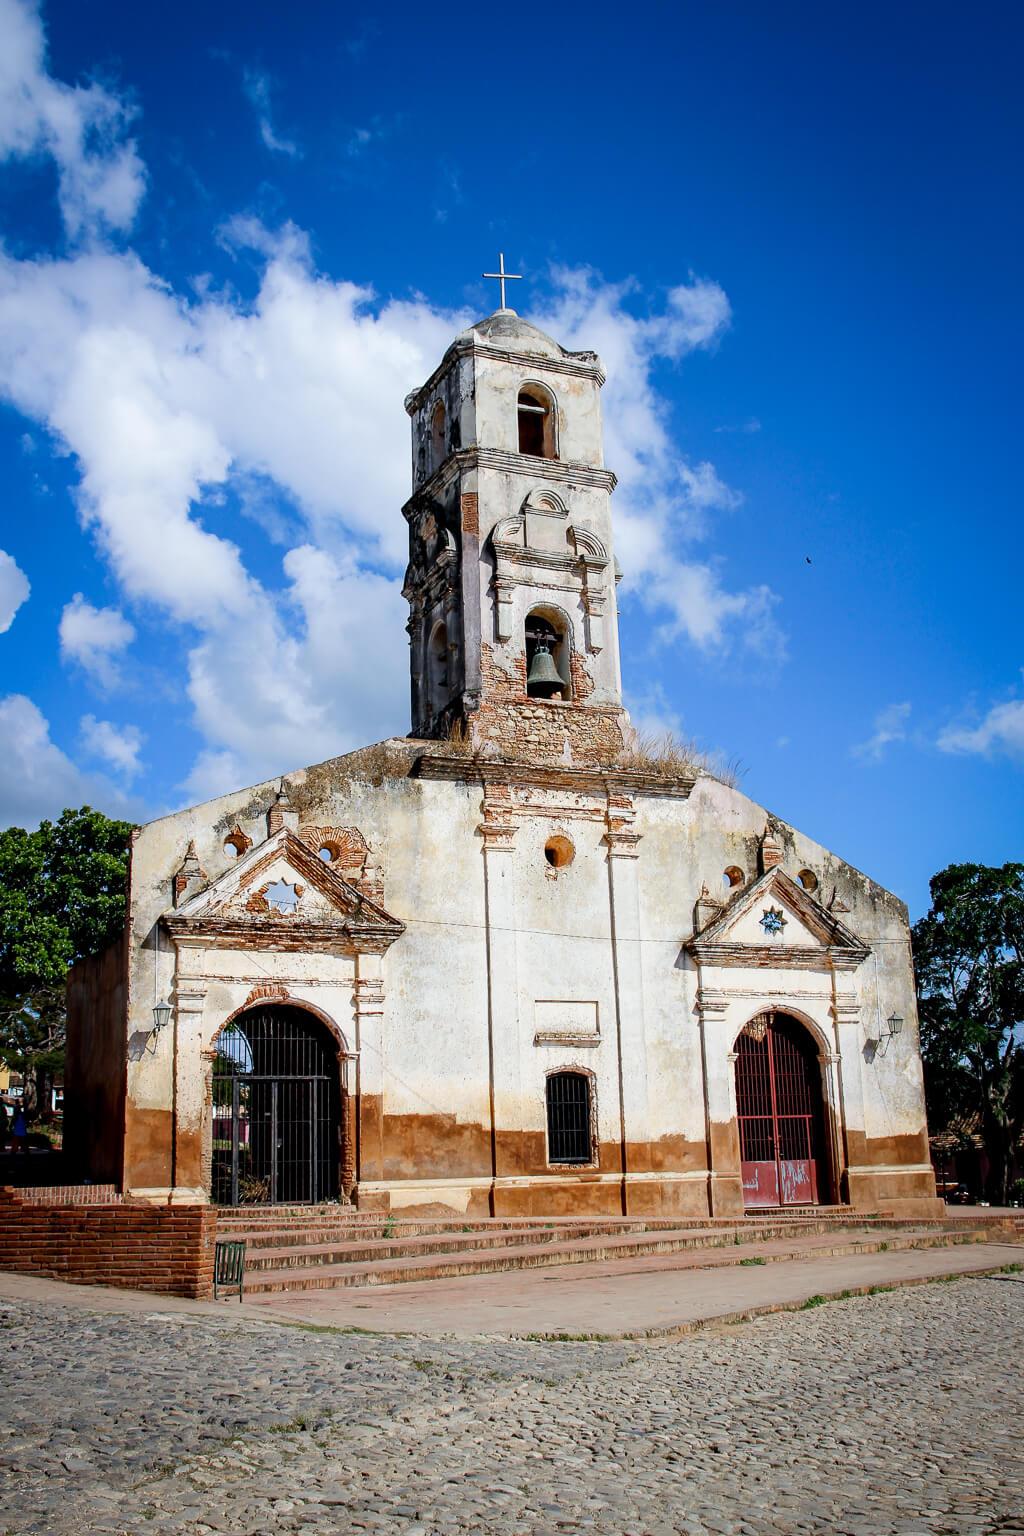 Trinidad Kuba Cuba Reisetipps Kolonialstadt Urlaub Travel Weltkulturerbe UNESCO tantedine